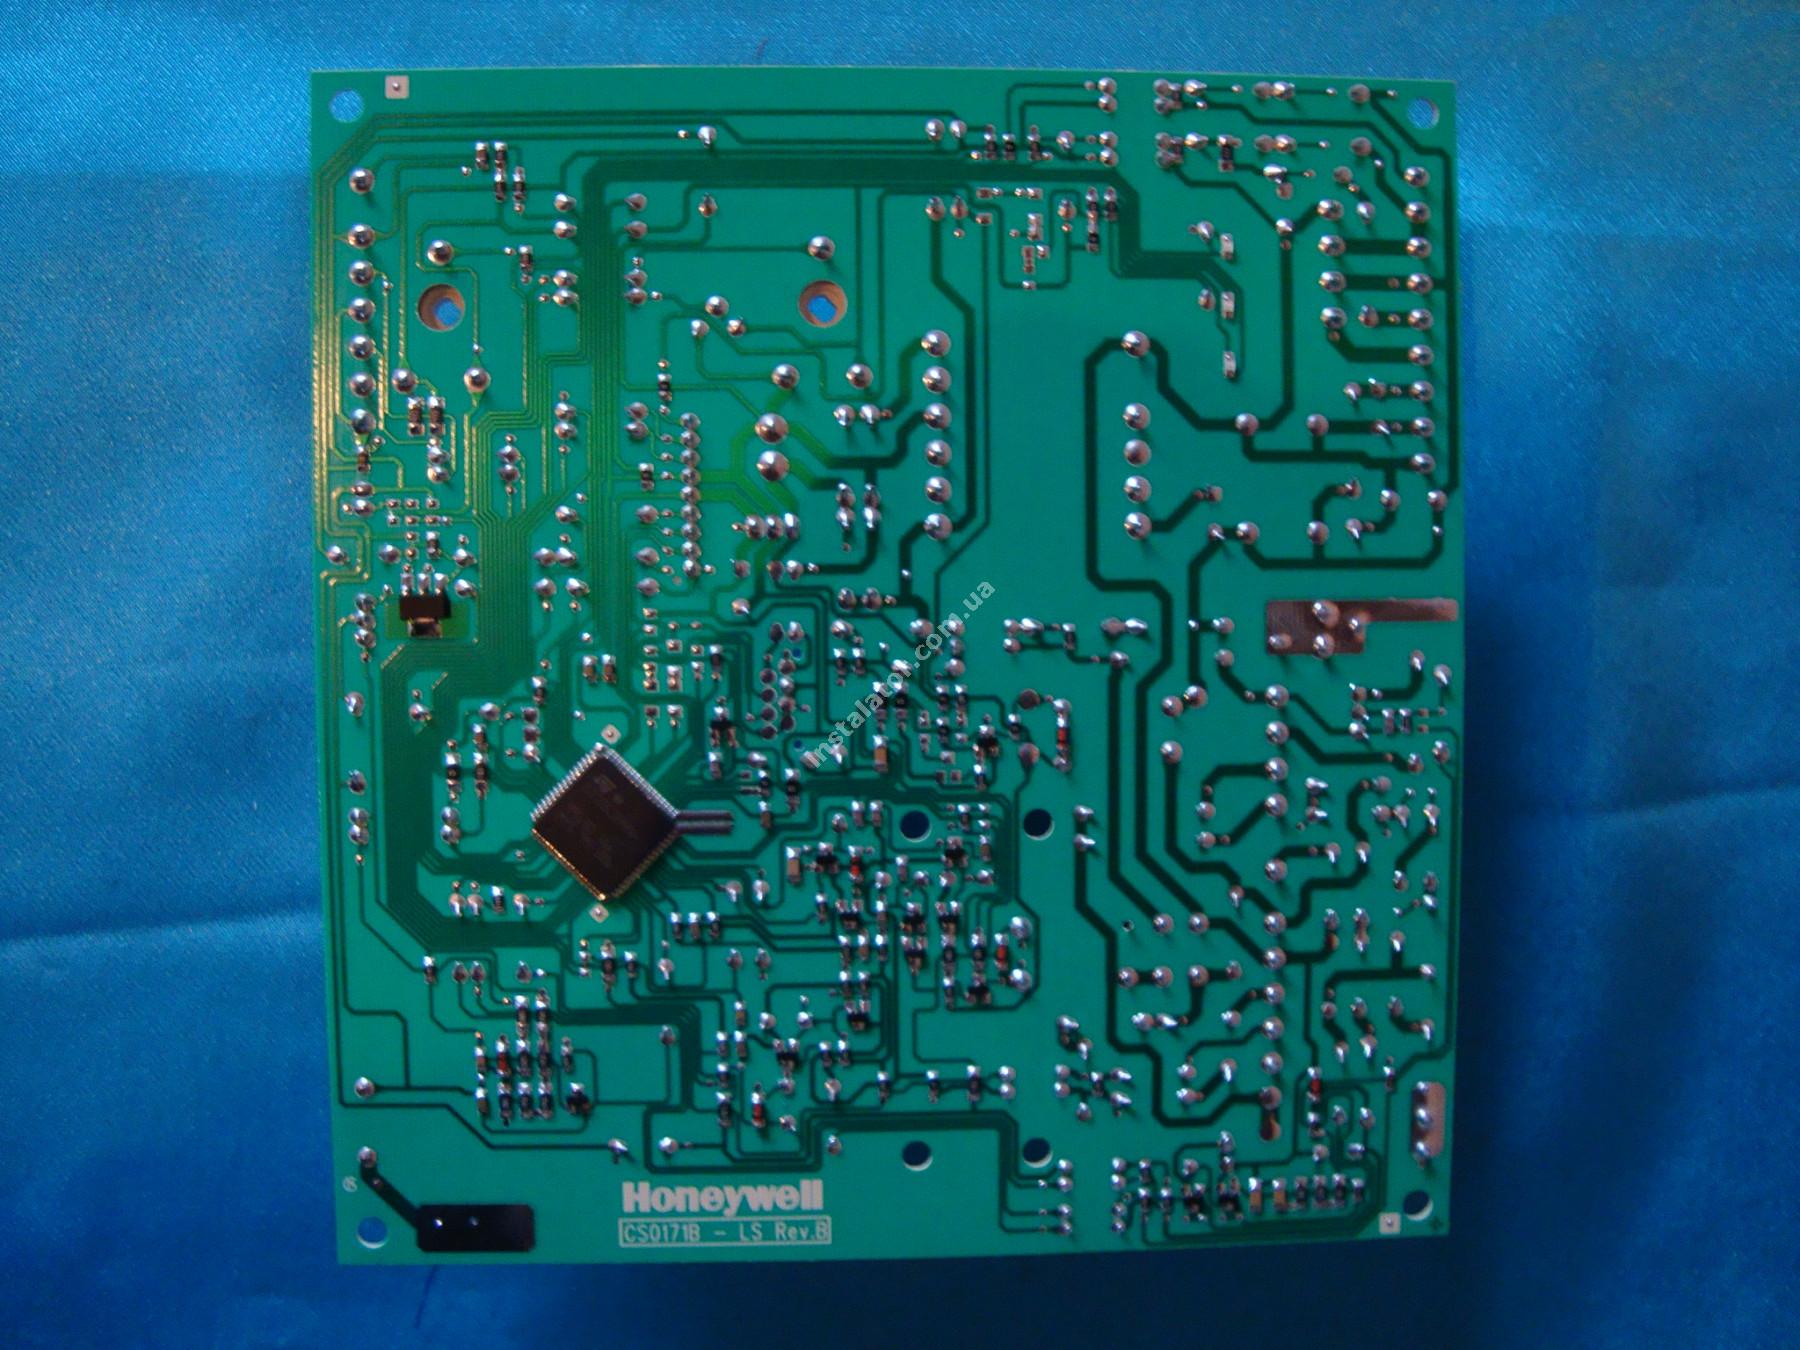 5669550 Плата керування  Westen Energy, Baxi Eco full-image-0